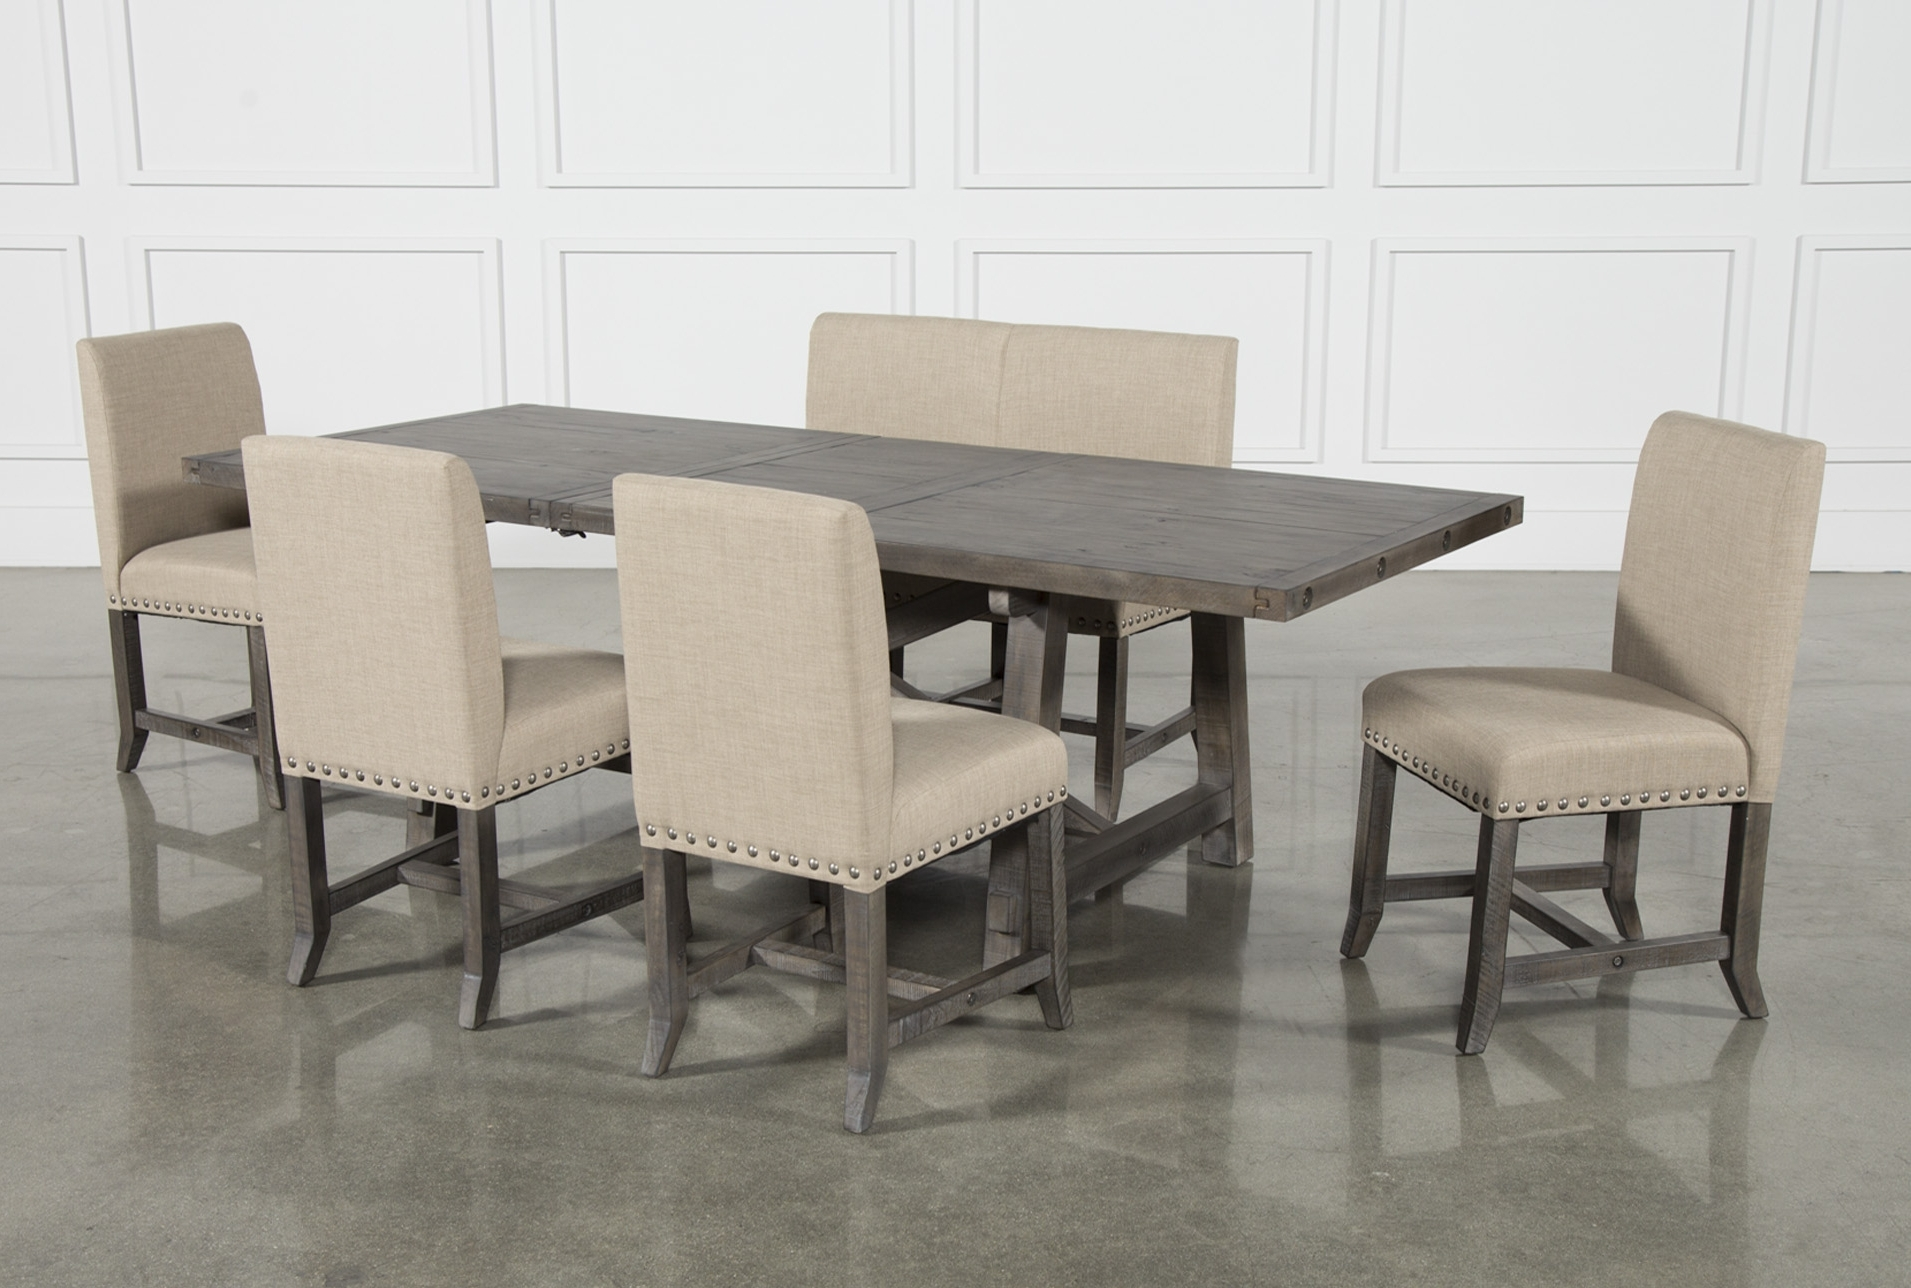 Most Popular Jaxon Grey 6 Piece Rectangle Extension Dining Set W/bench & Uph Regarding Jaxon Grey 6 Piece Rectangle Extension Dining Sets With Bench & Wood Chairs (Gallery 2 of 25)